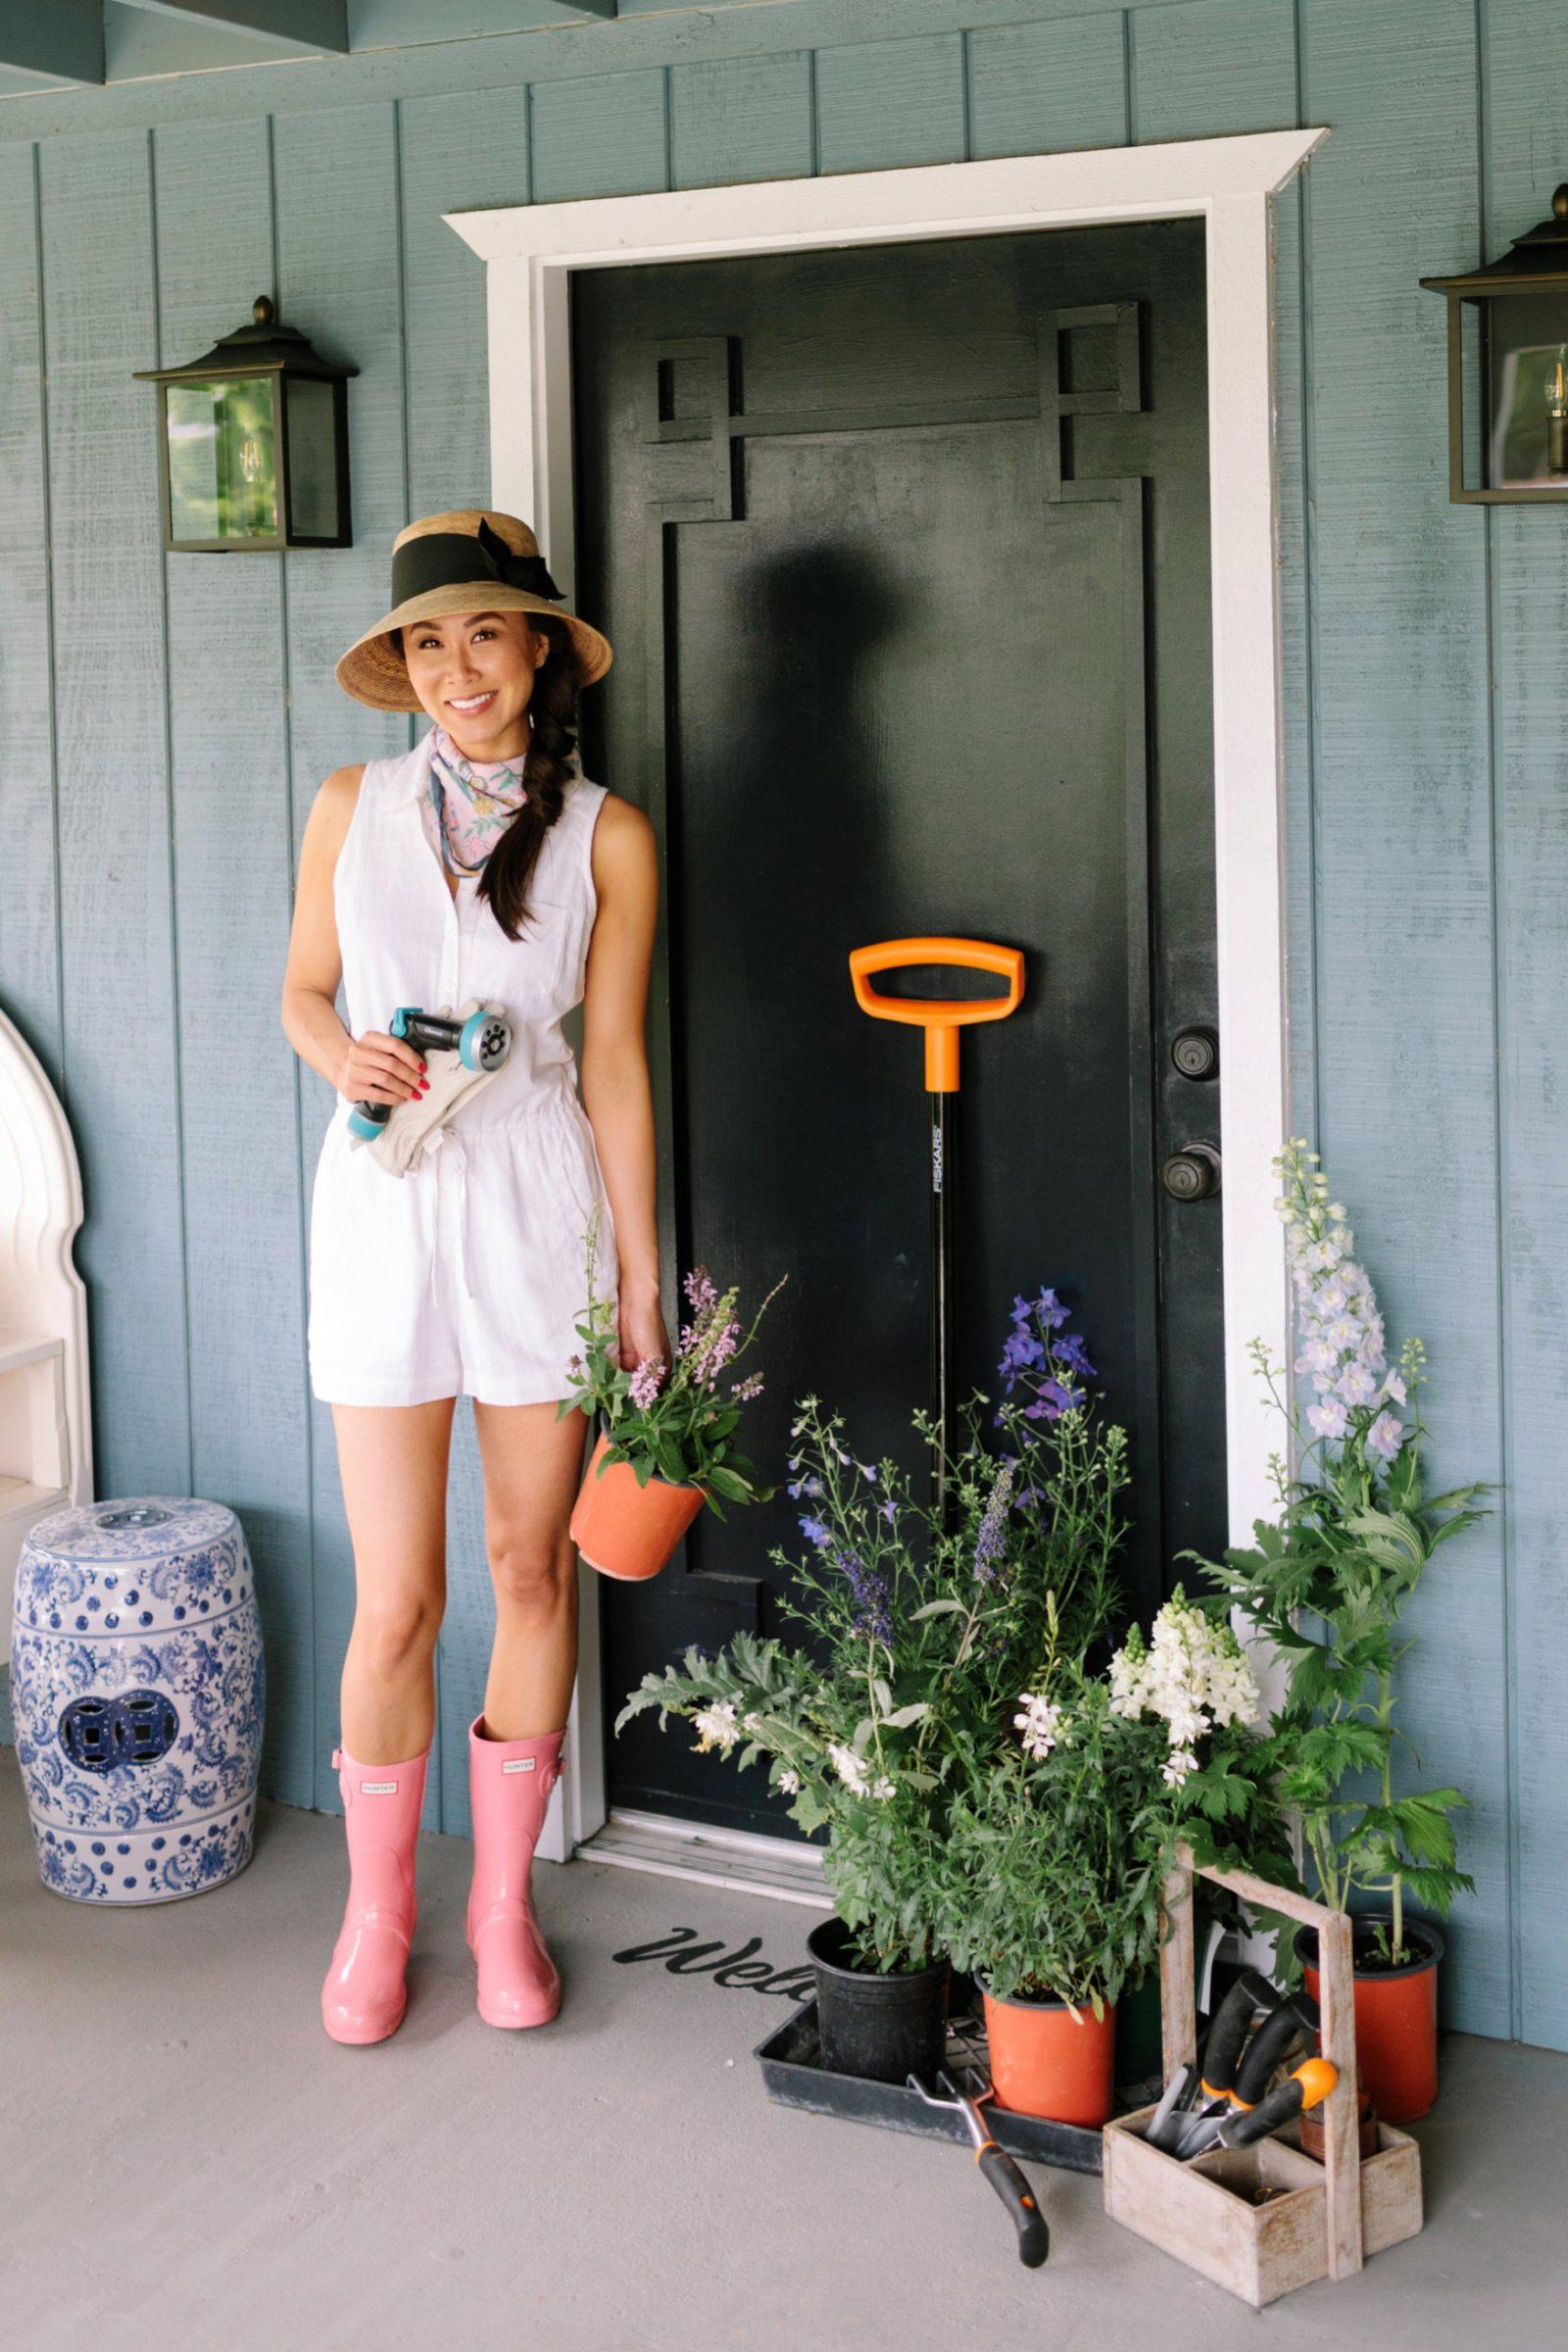 Into the garden front door greek key design plants from the nursery and new garden tools